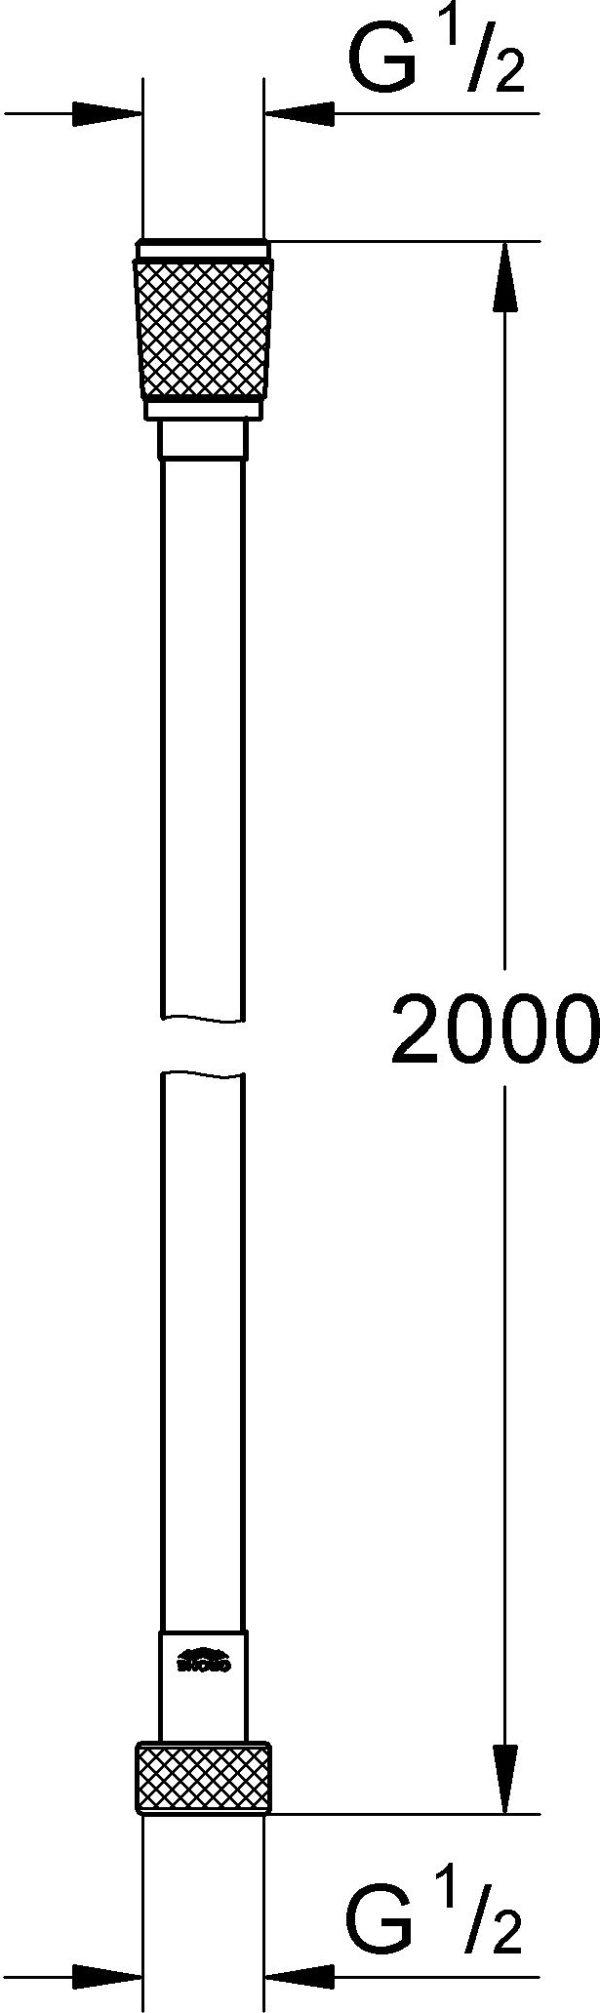 Душевой шланг Grohe Silverflex 28388000